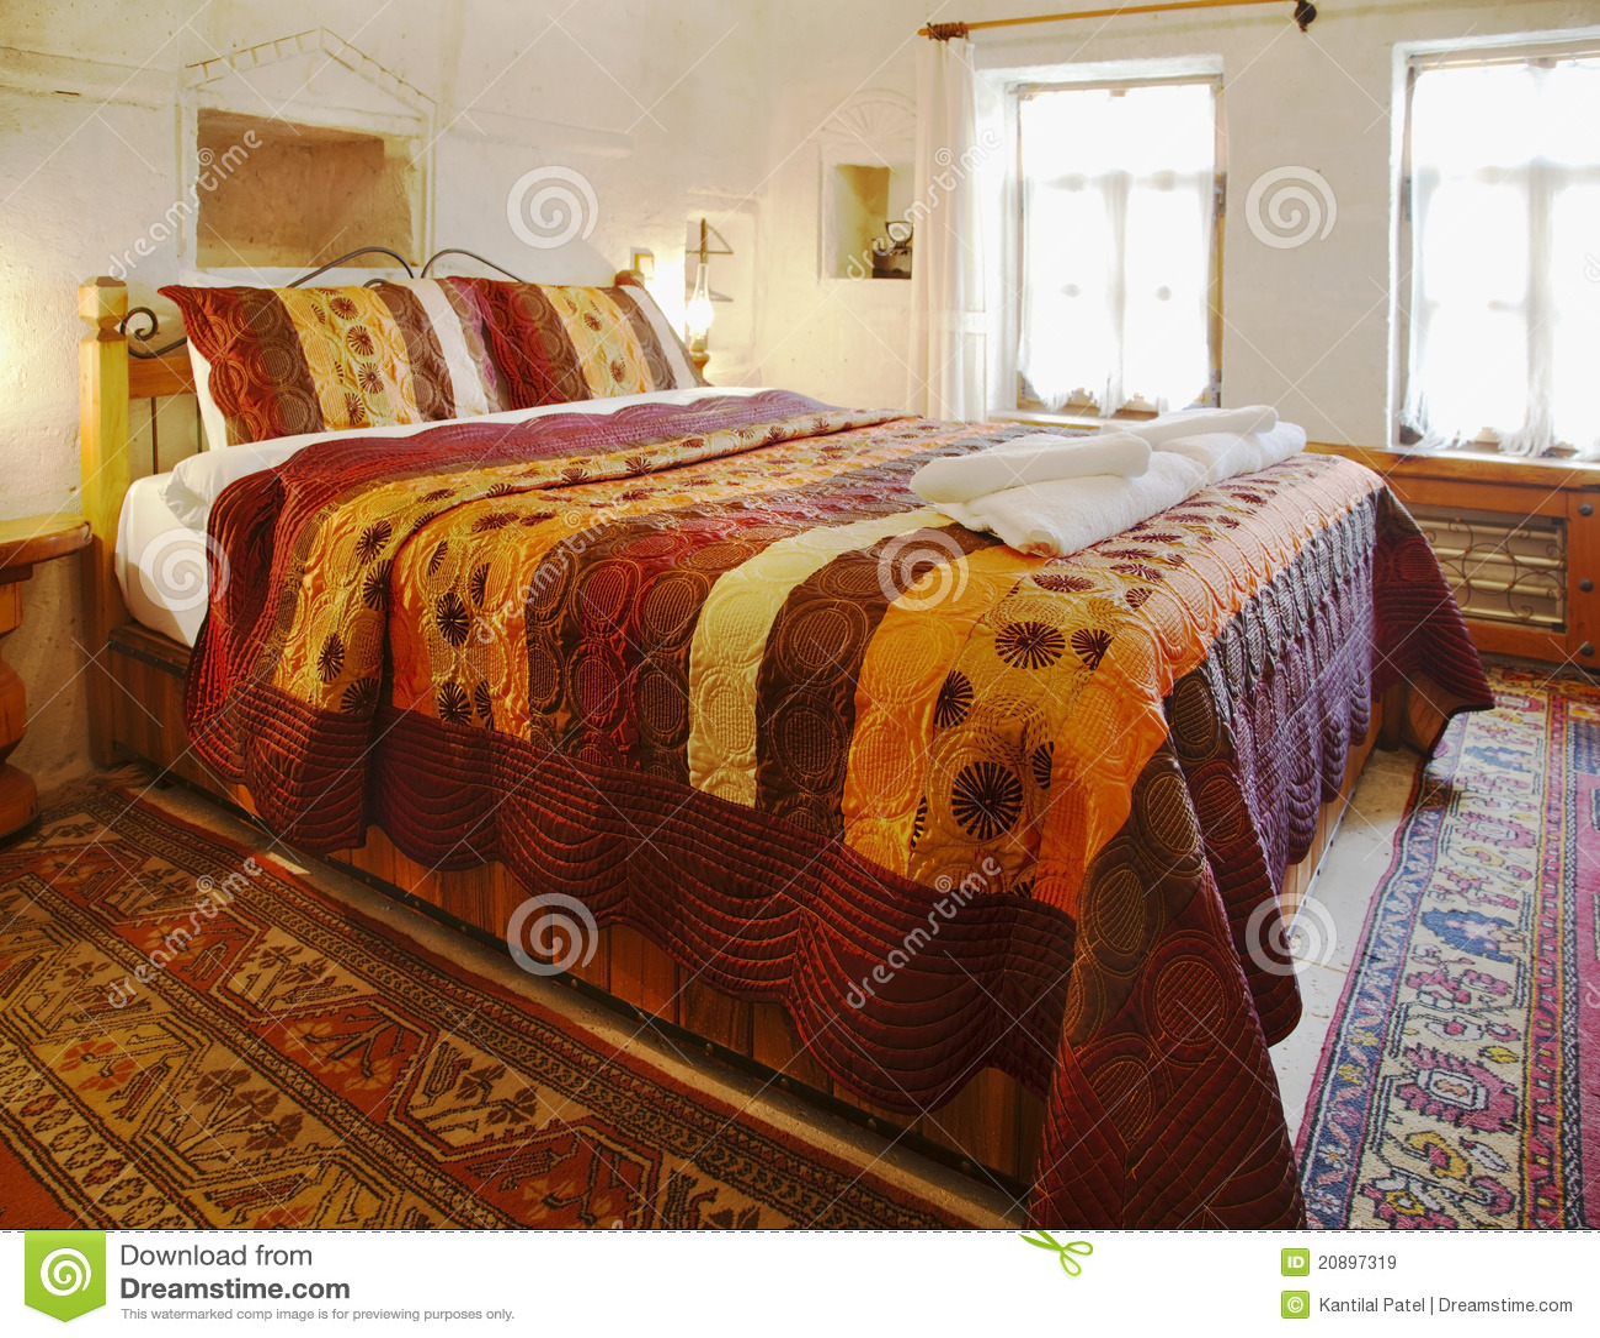 Interior Design Cave Bedroom Multi Colored Bedding Royalty